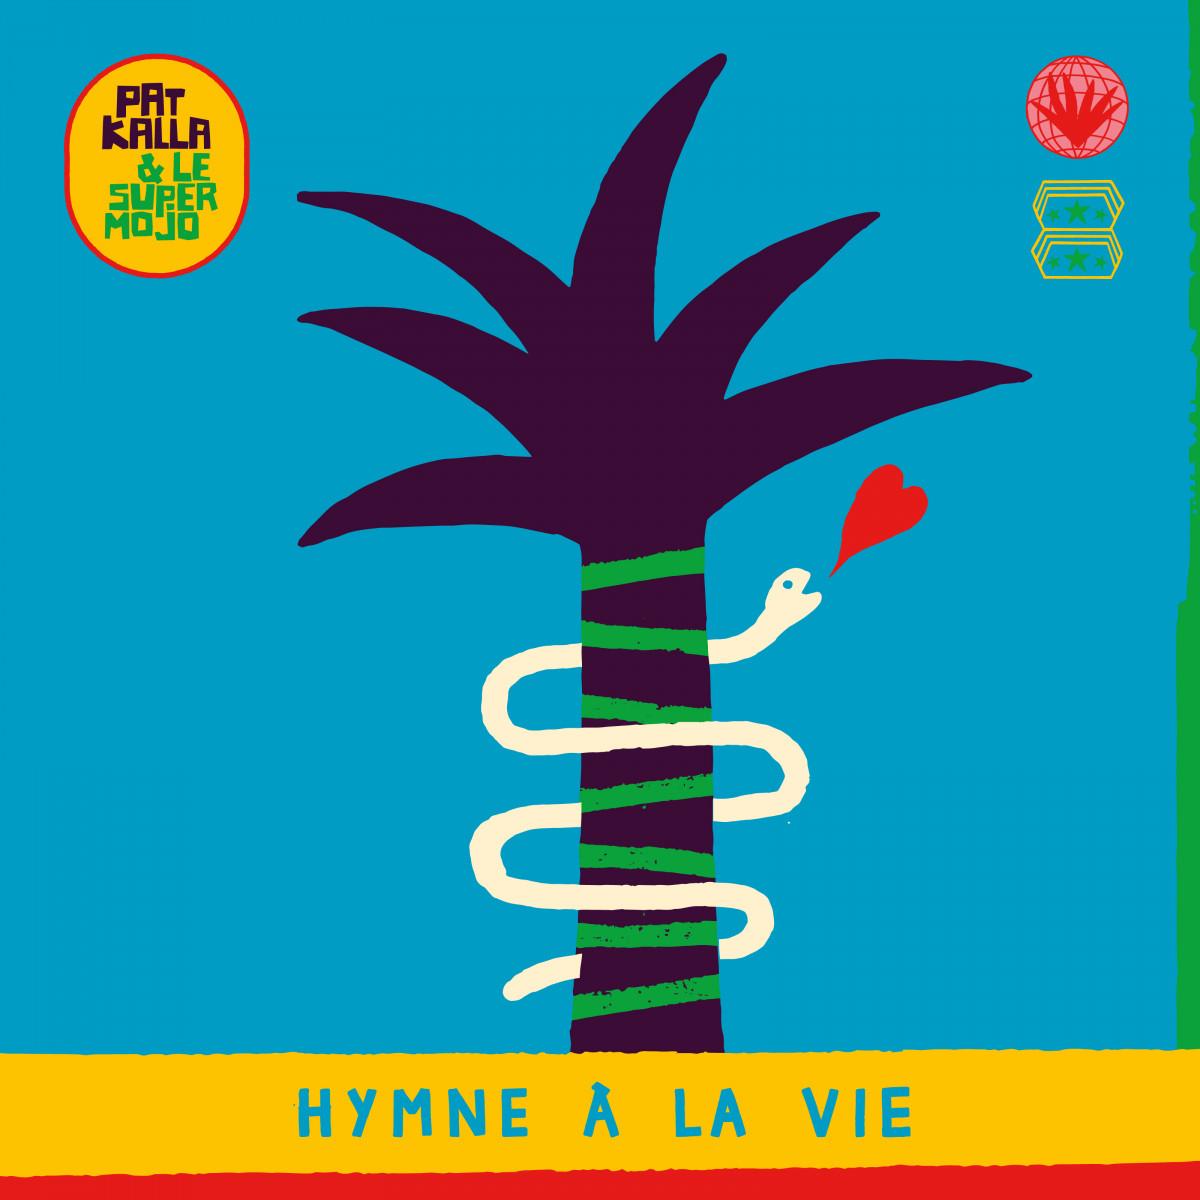 PAT KALLA & LE SUPER MOJO - HYMNE À LA VIE / HEAVENLY SWEETNESS PVS014VL - Vinyl